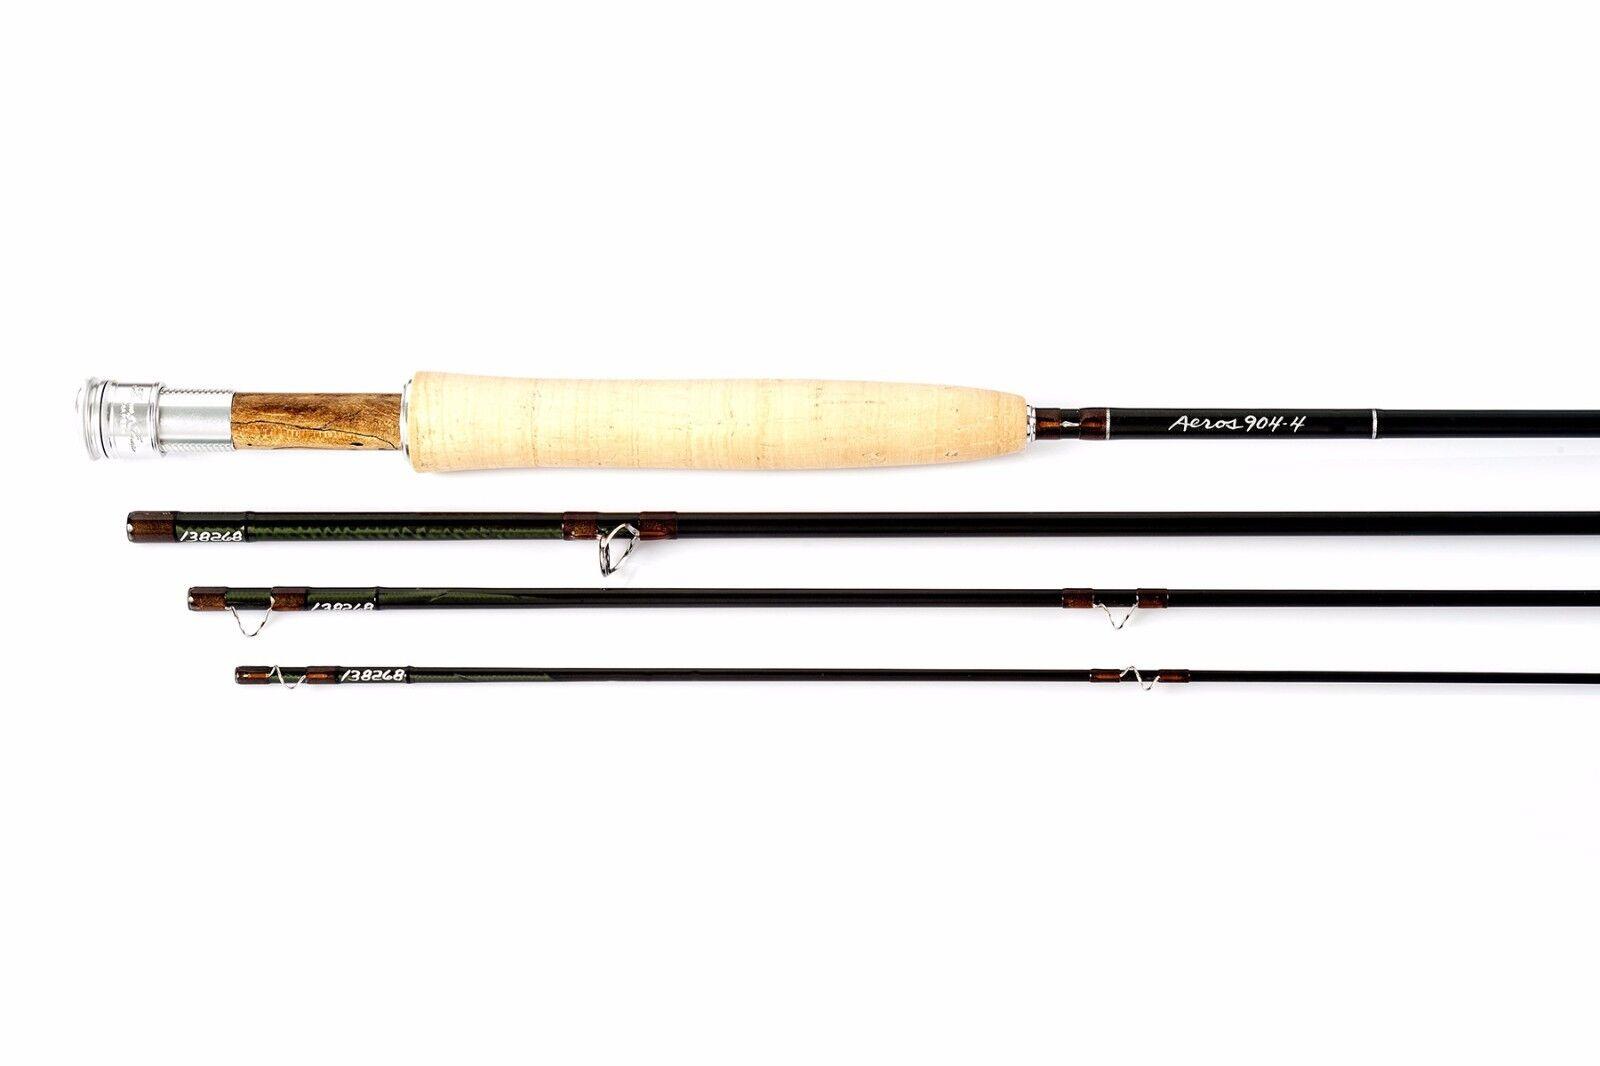 Thomas and Thomas Aeros Series Rods Shop -- Streams of Dreams Fly Shop Rods 564310